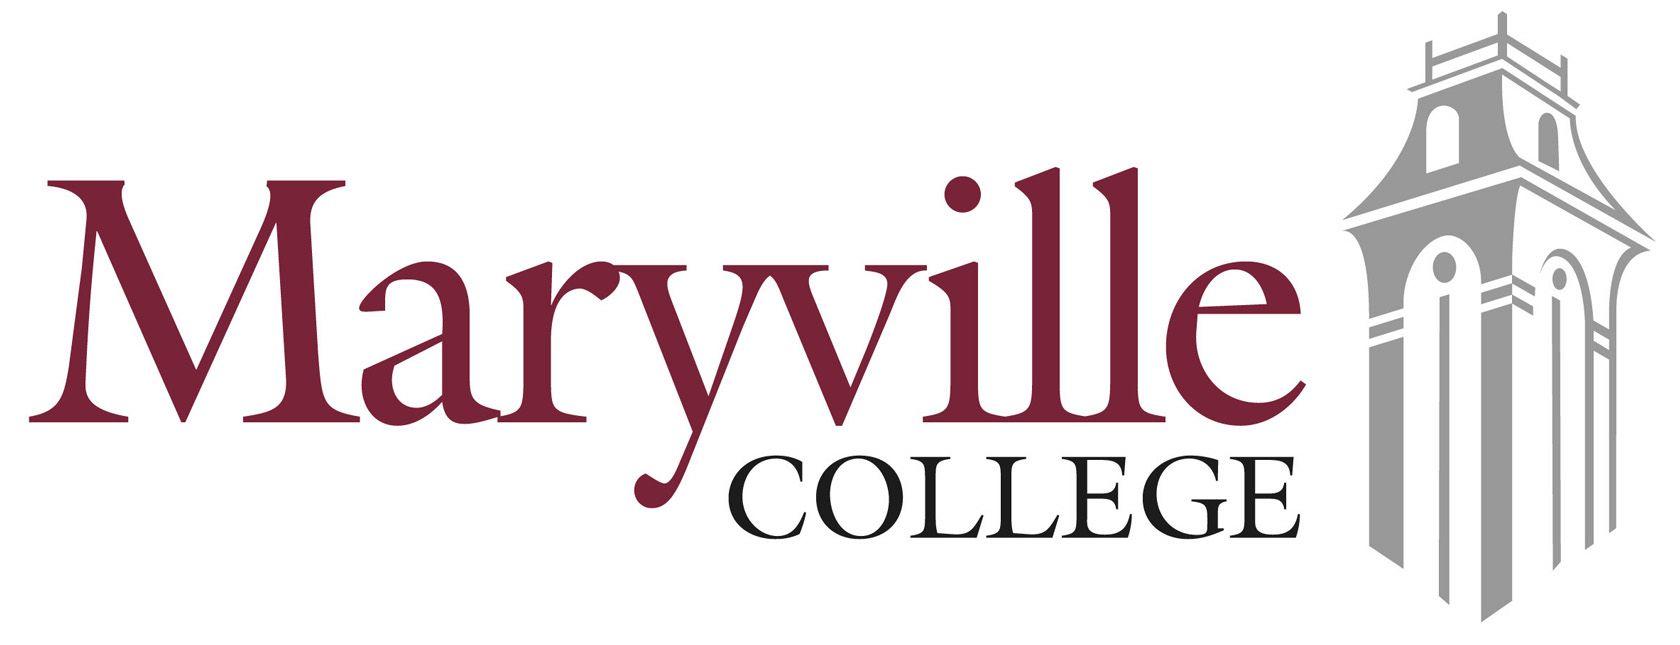 Maryville College Home... Maryville college, College